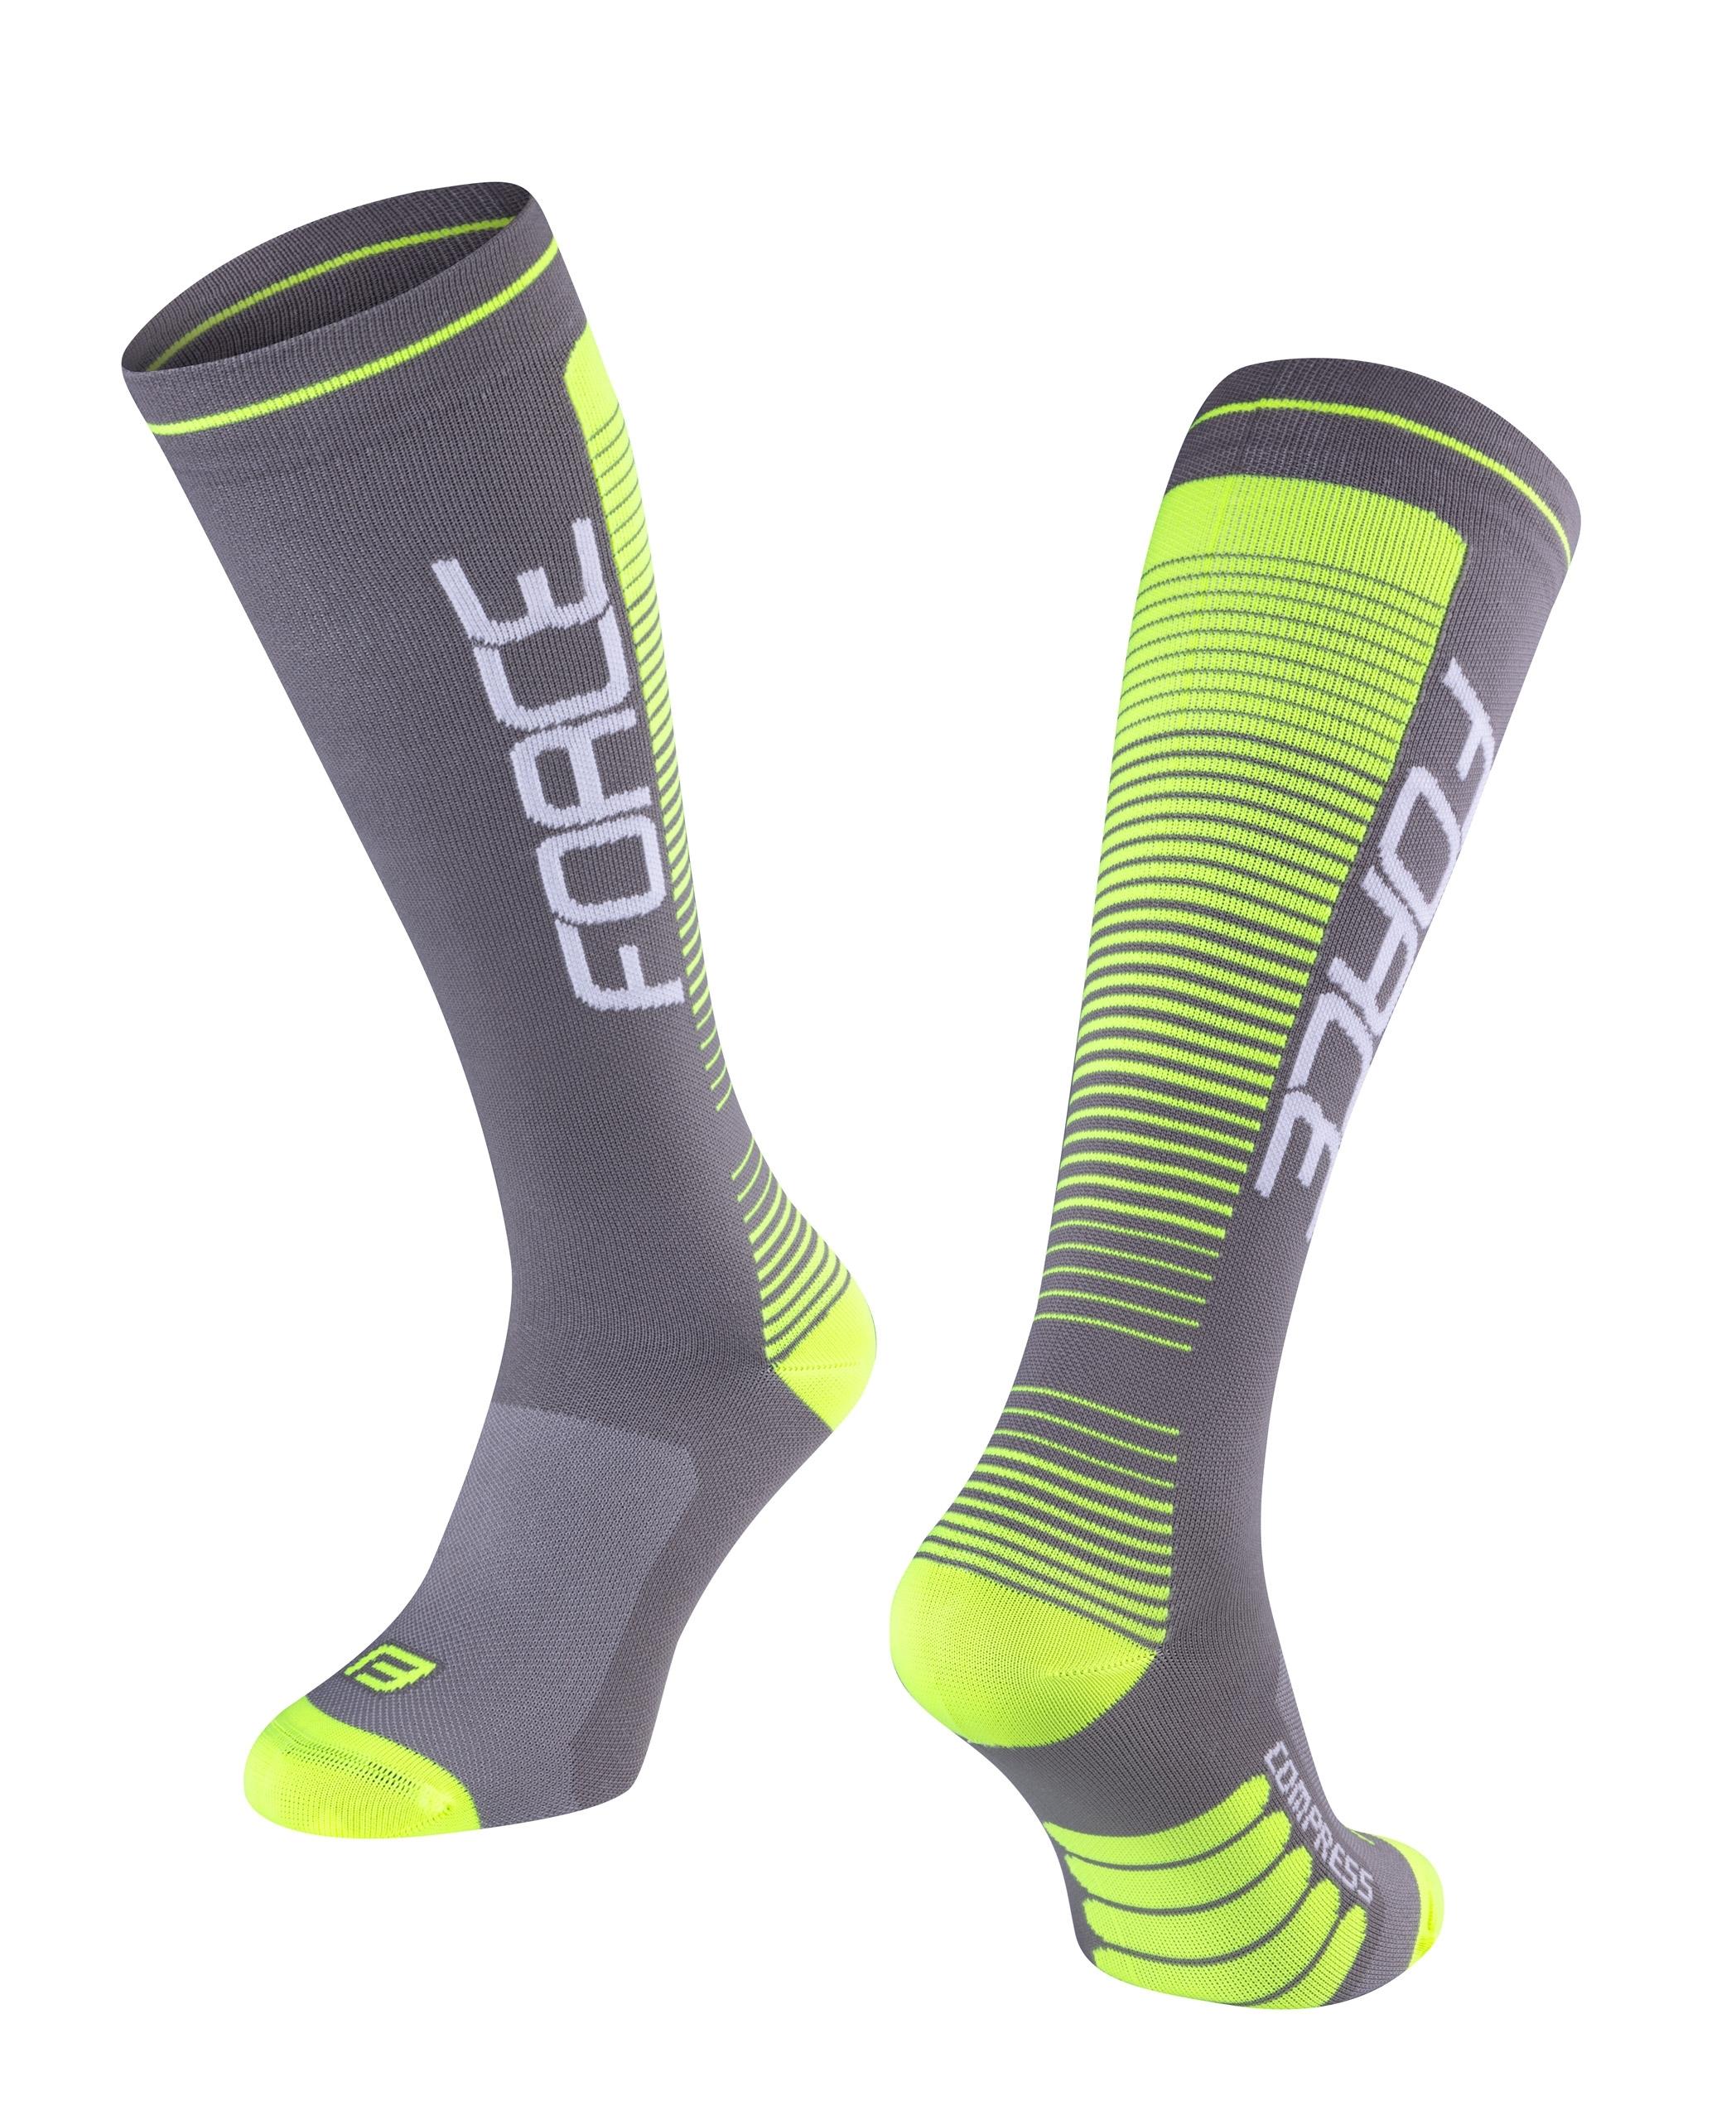 ponožky F COMPRESS, šedo-fluo S-M/36-41